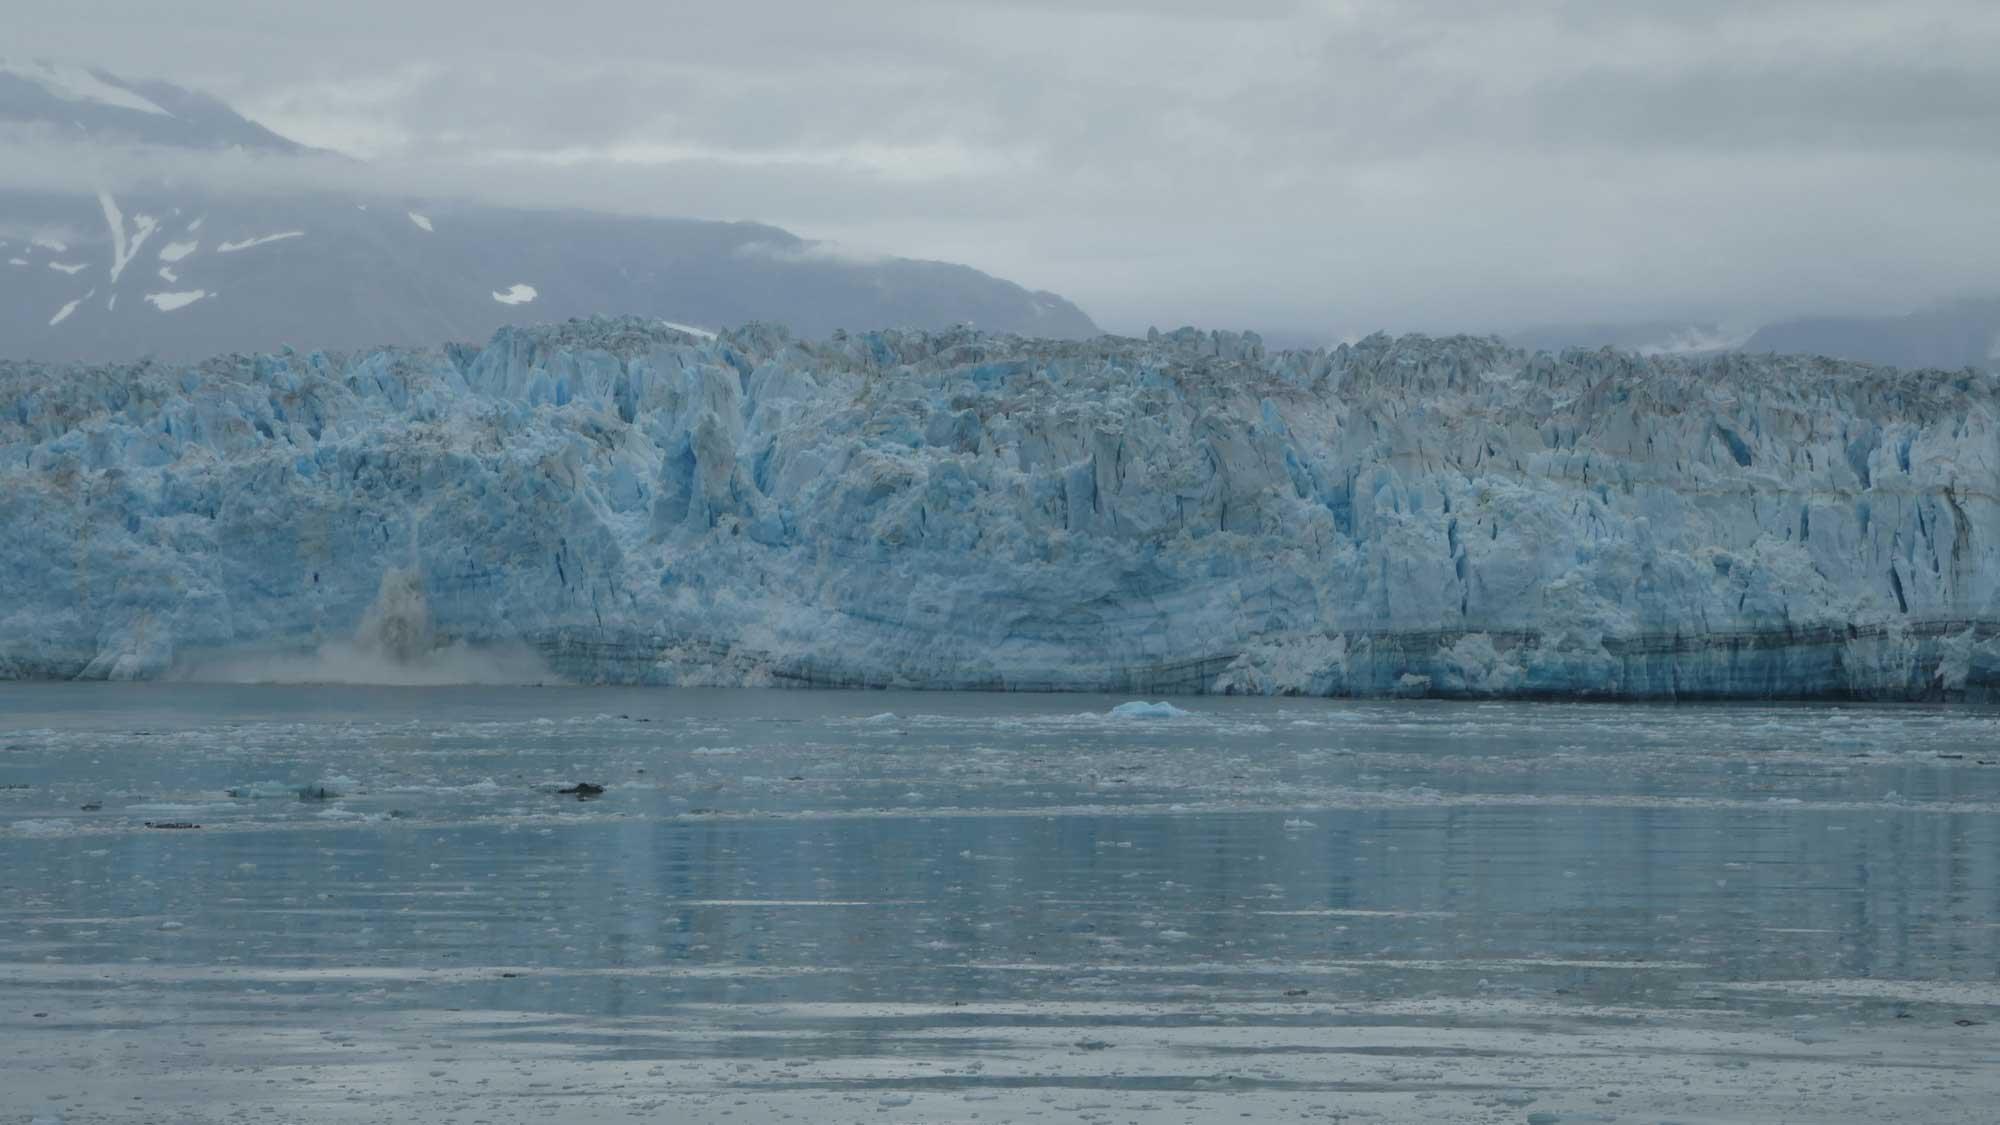 Photograph of Hubbard Glacier in Alaska.